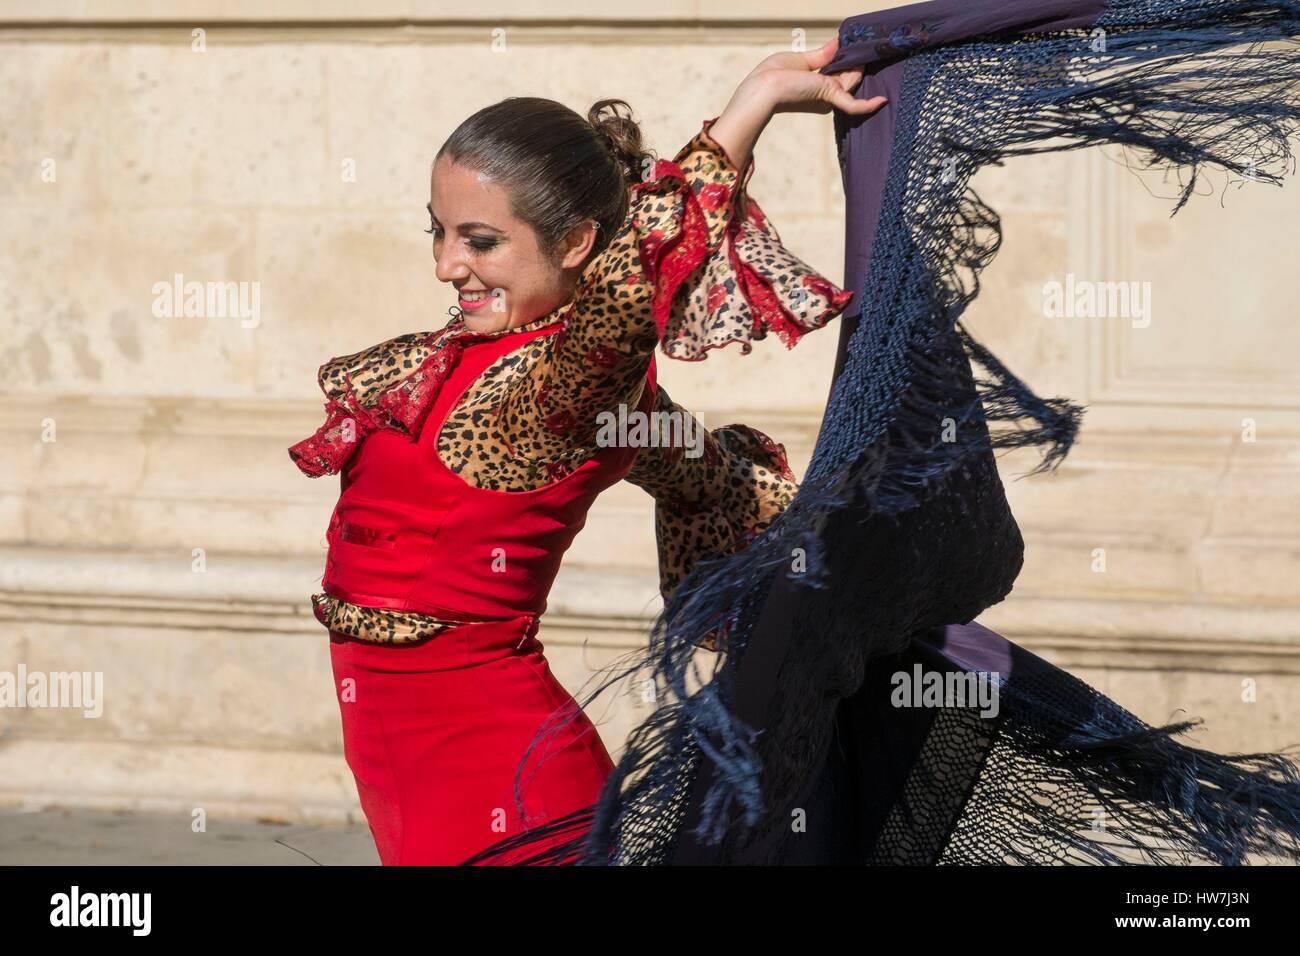 Spain, Andalusia, Seville, Santa Cruz district, Flamenco dancer - Stock Image